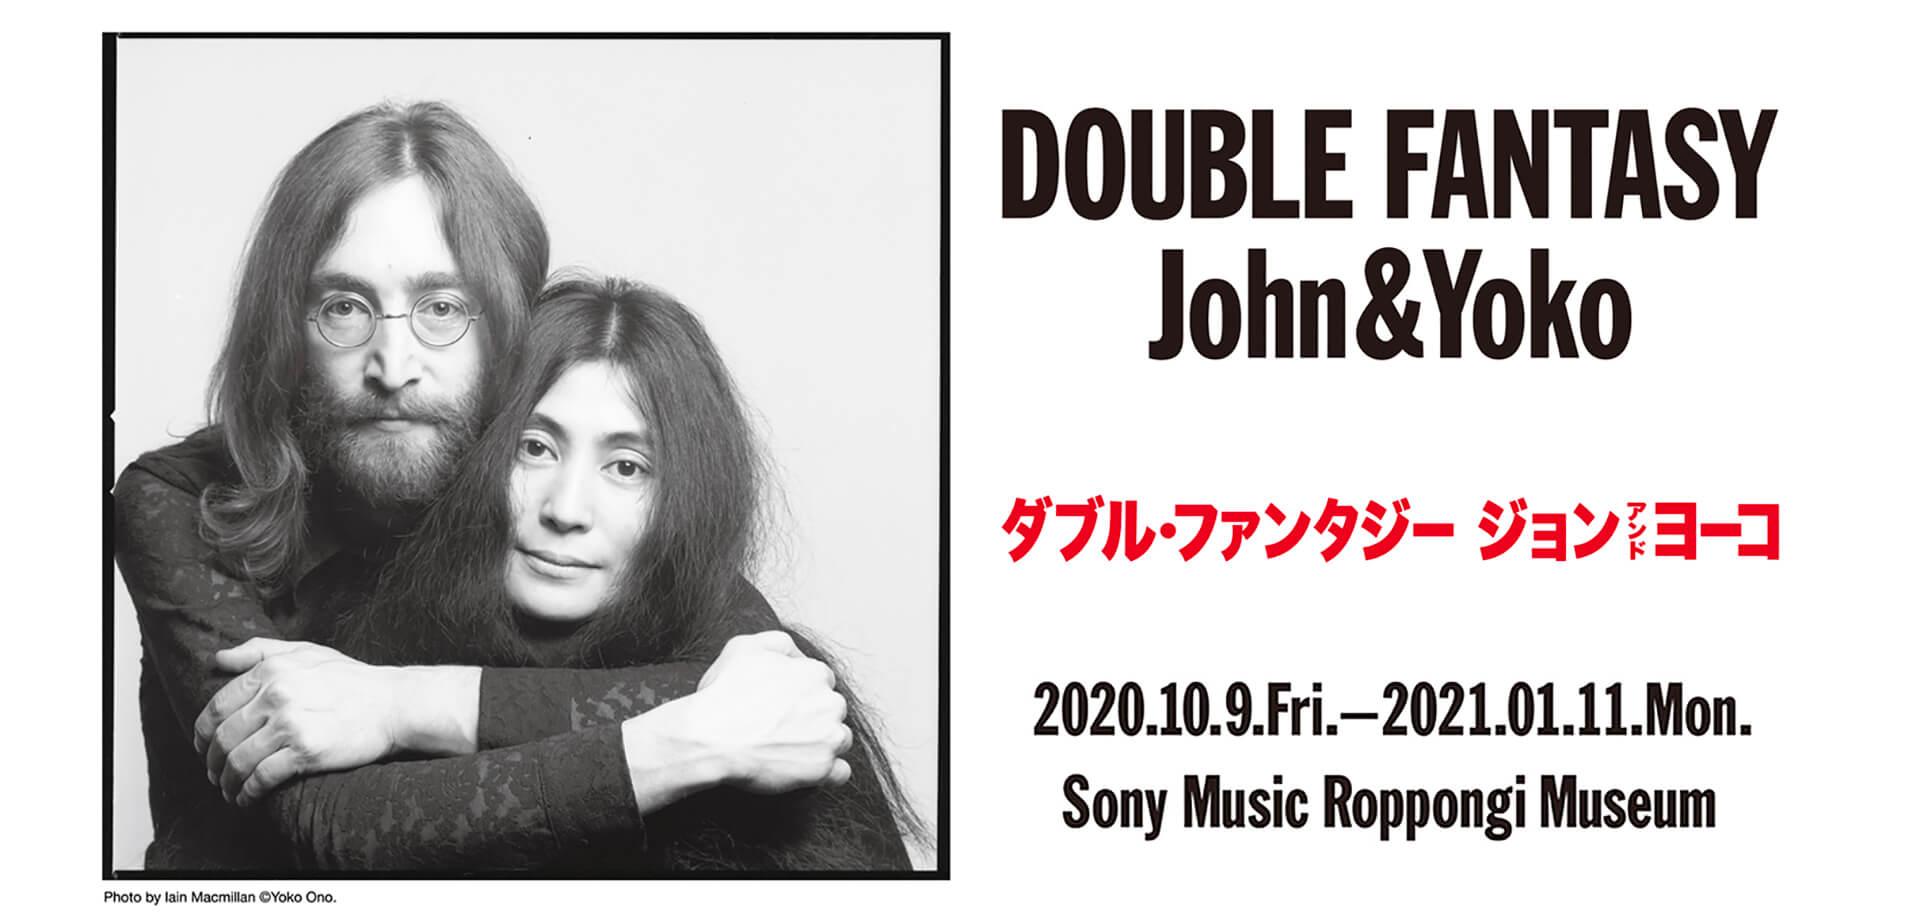 『DOUBLE FANTASY - John & Yoko』東京展